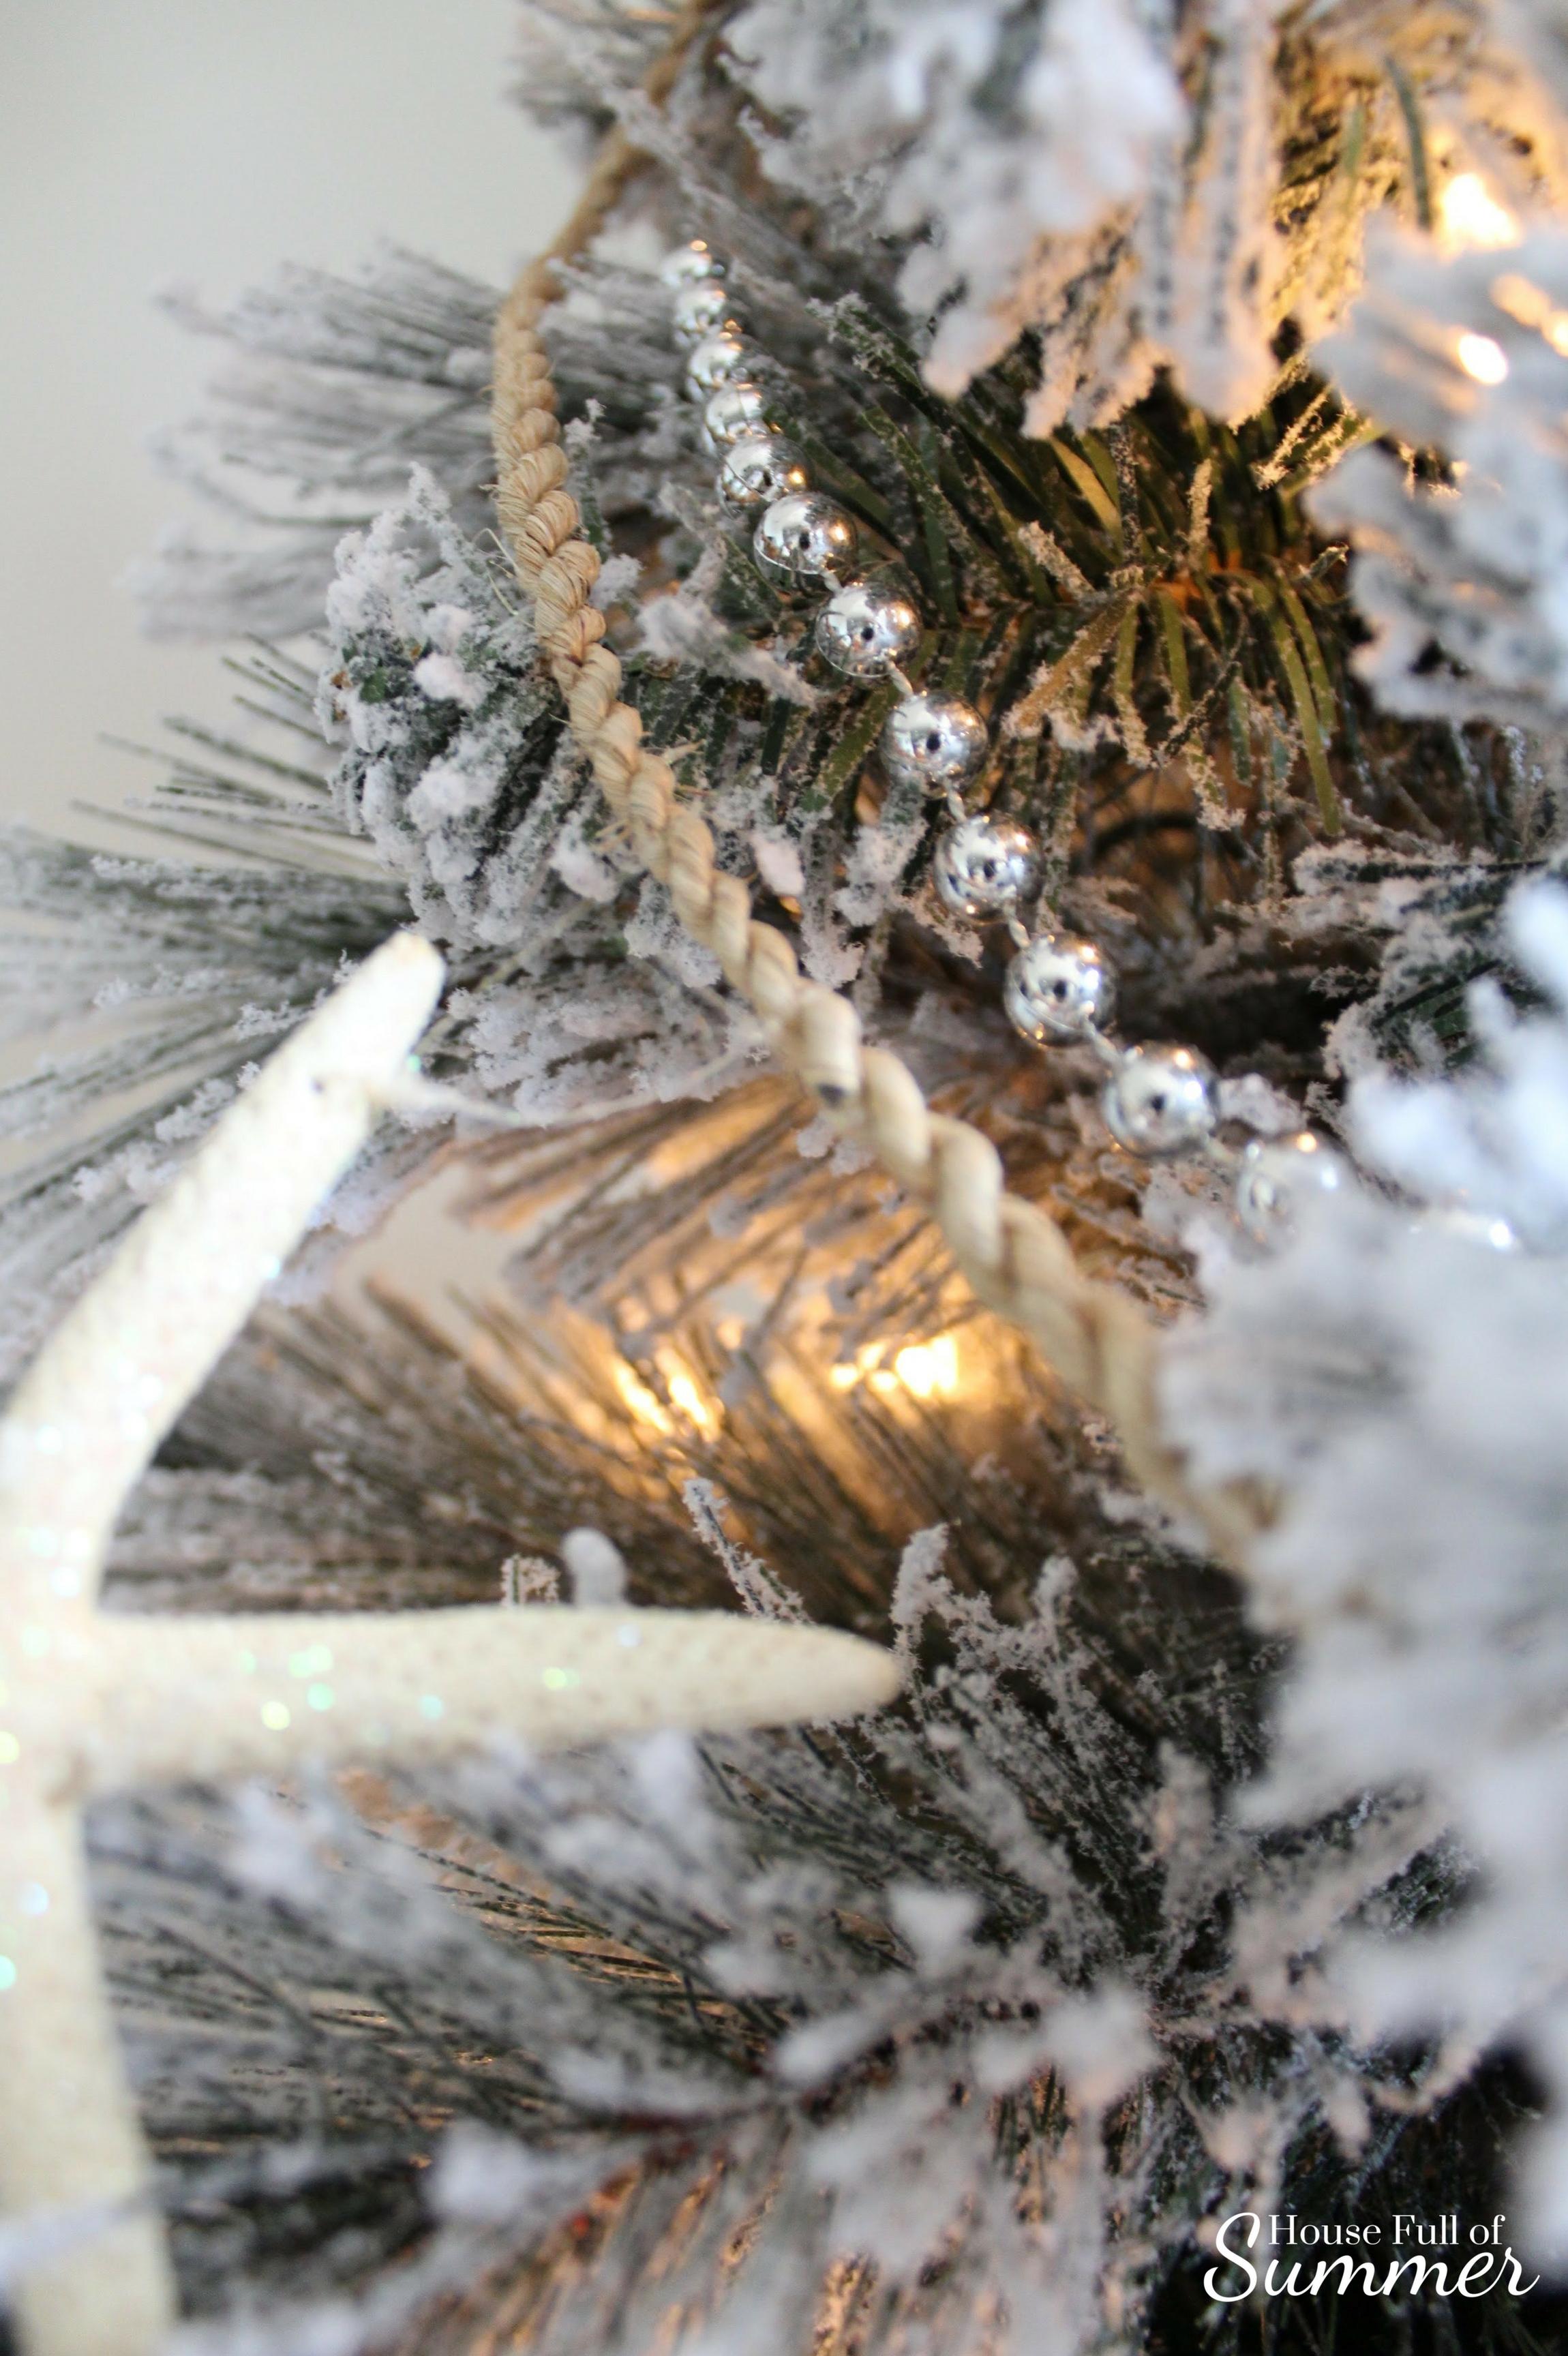 Classy Christmas Home Tour {Part Two} | House Full of Summer blog - christmas tree decor, coastal christmas tree, flocked pencil tree, seashell garland